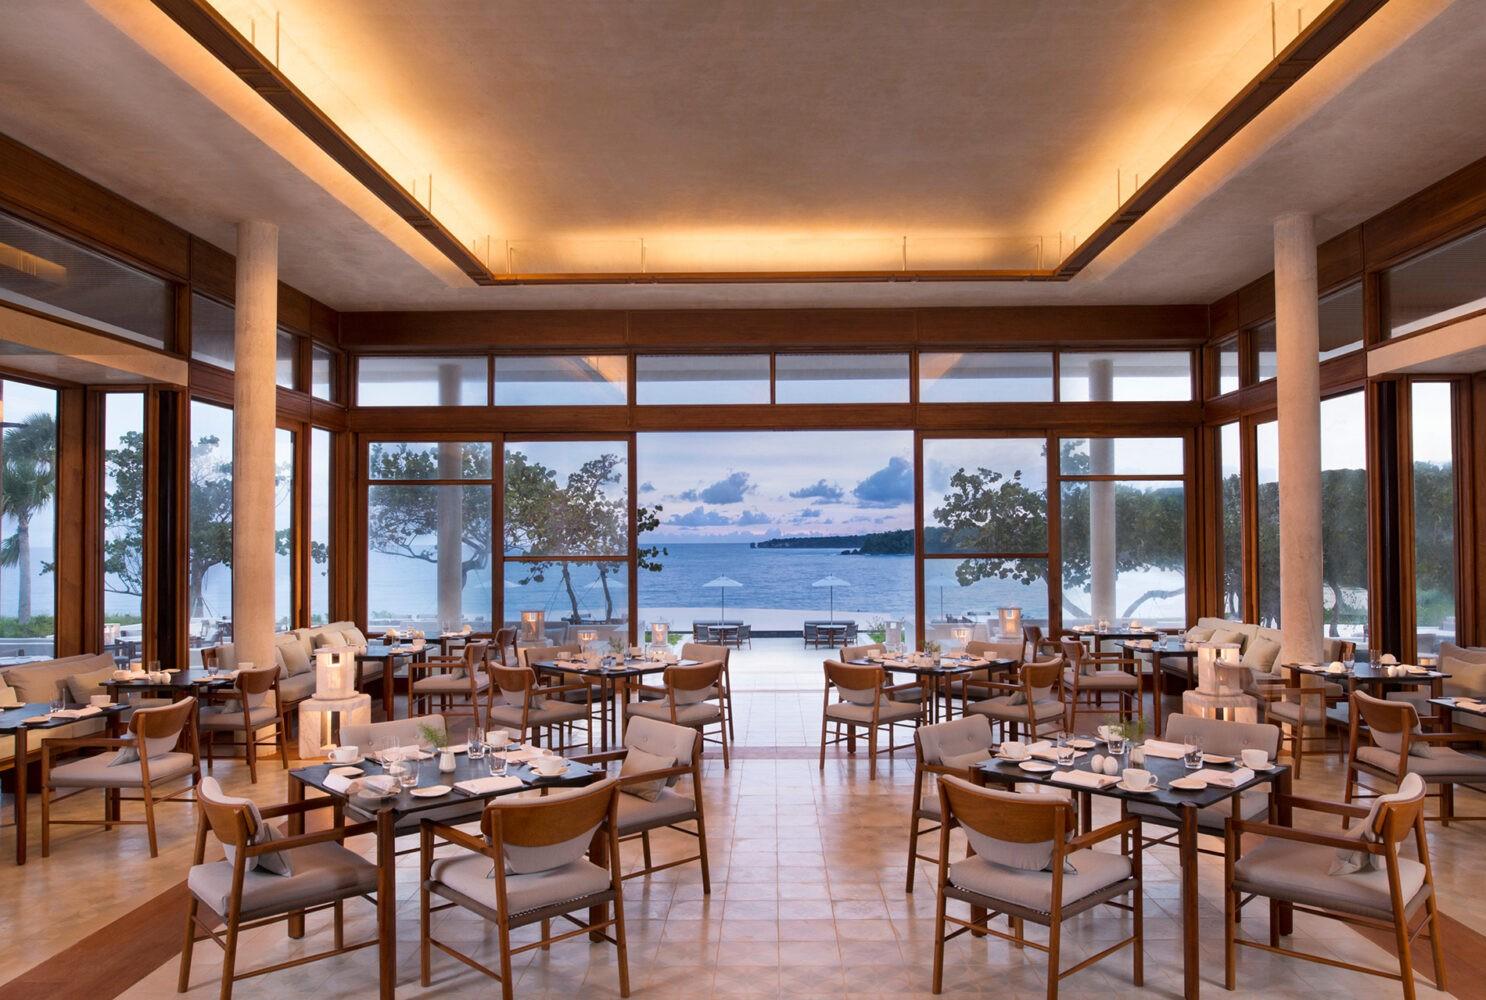 amanera-main-restaurant